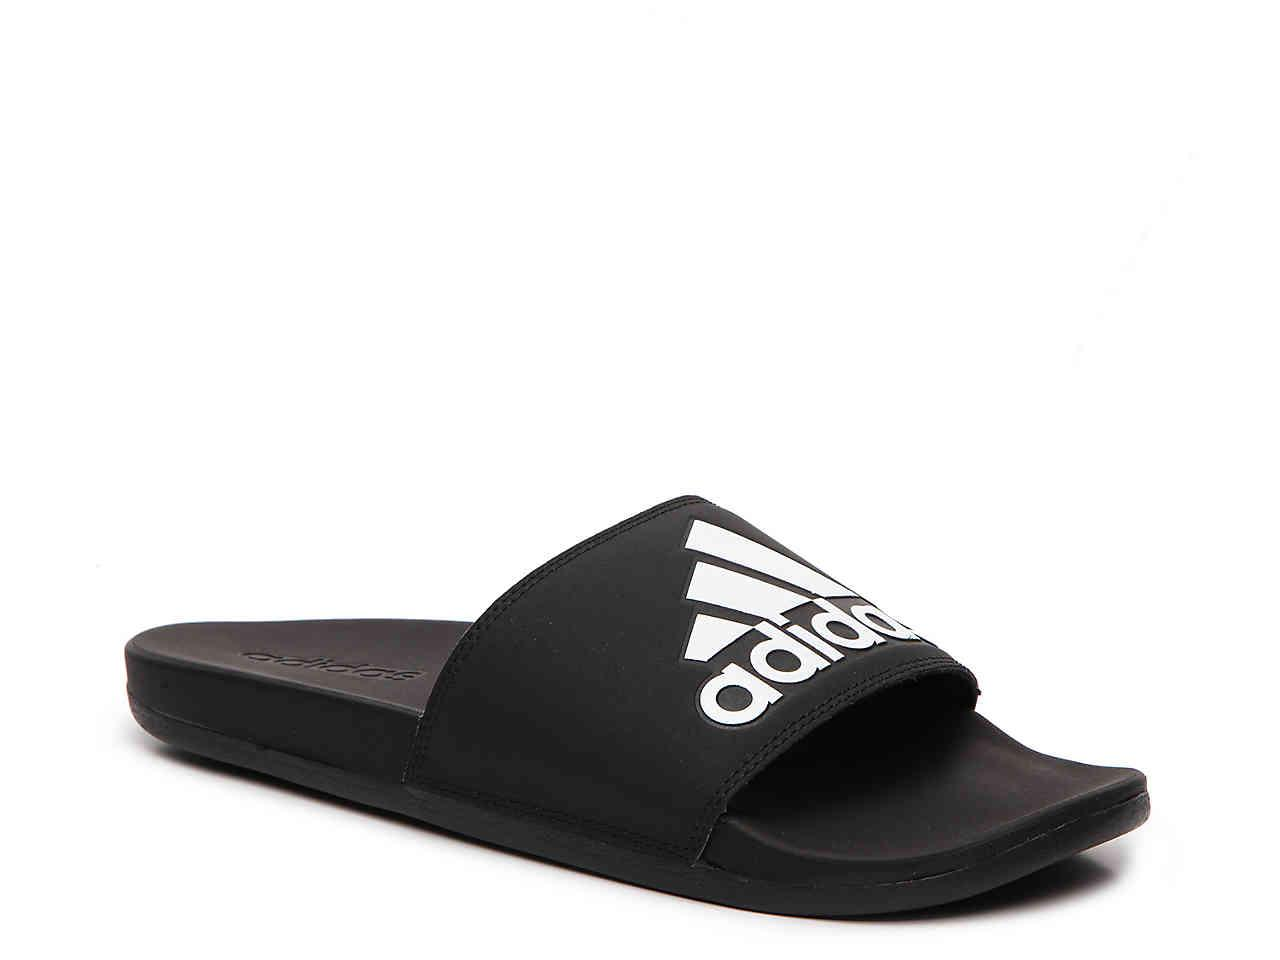 Lyst Adidas Adilette Cf Plus Slide Sandale in Schwarz